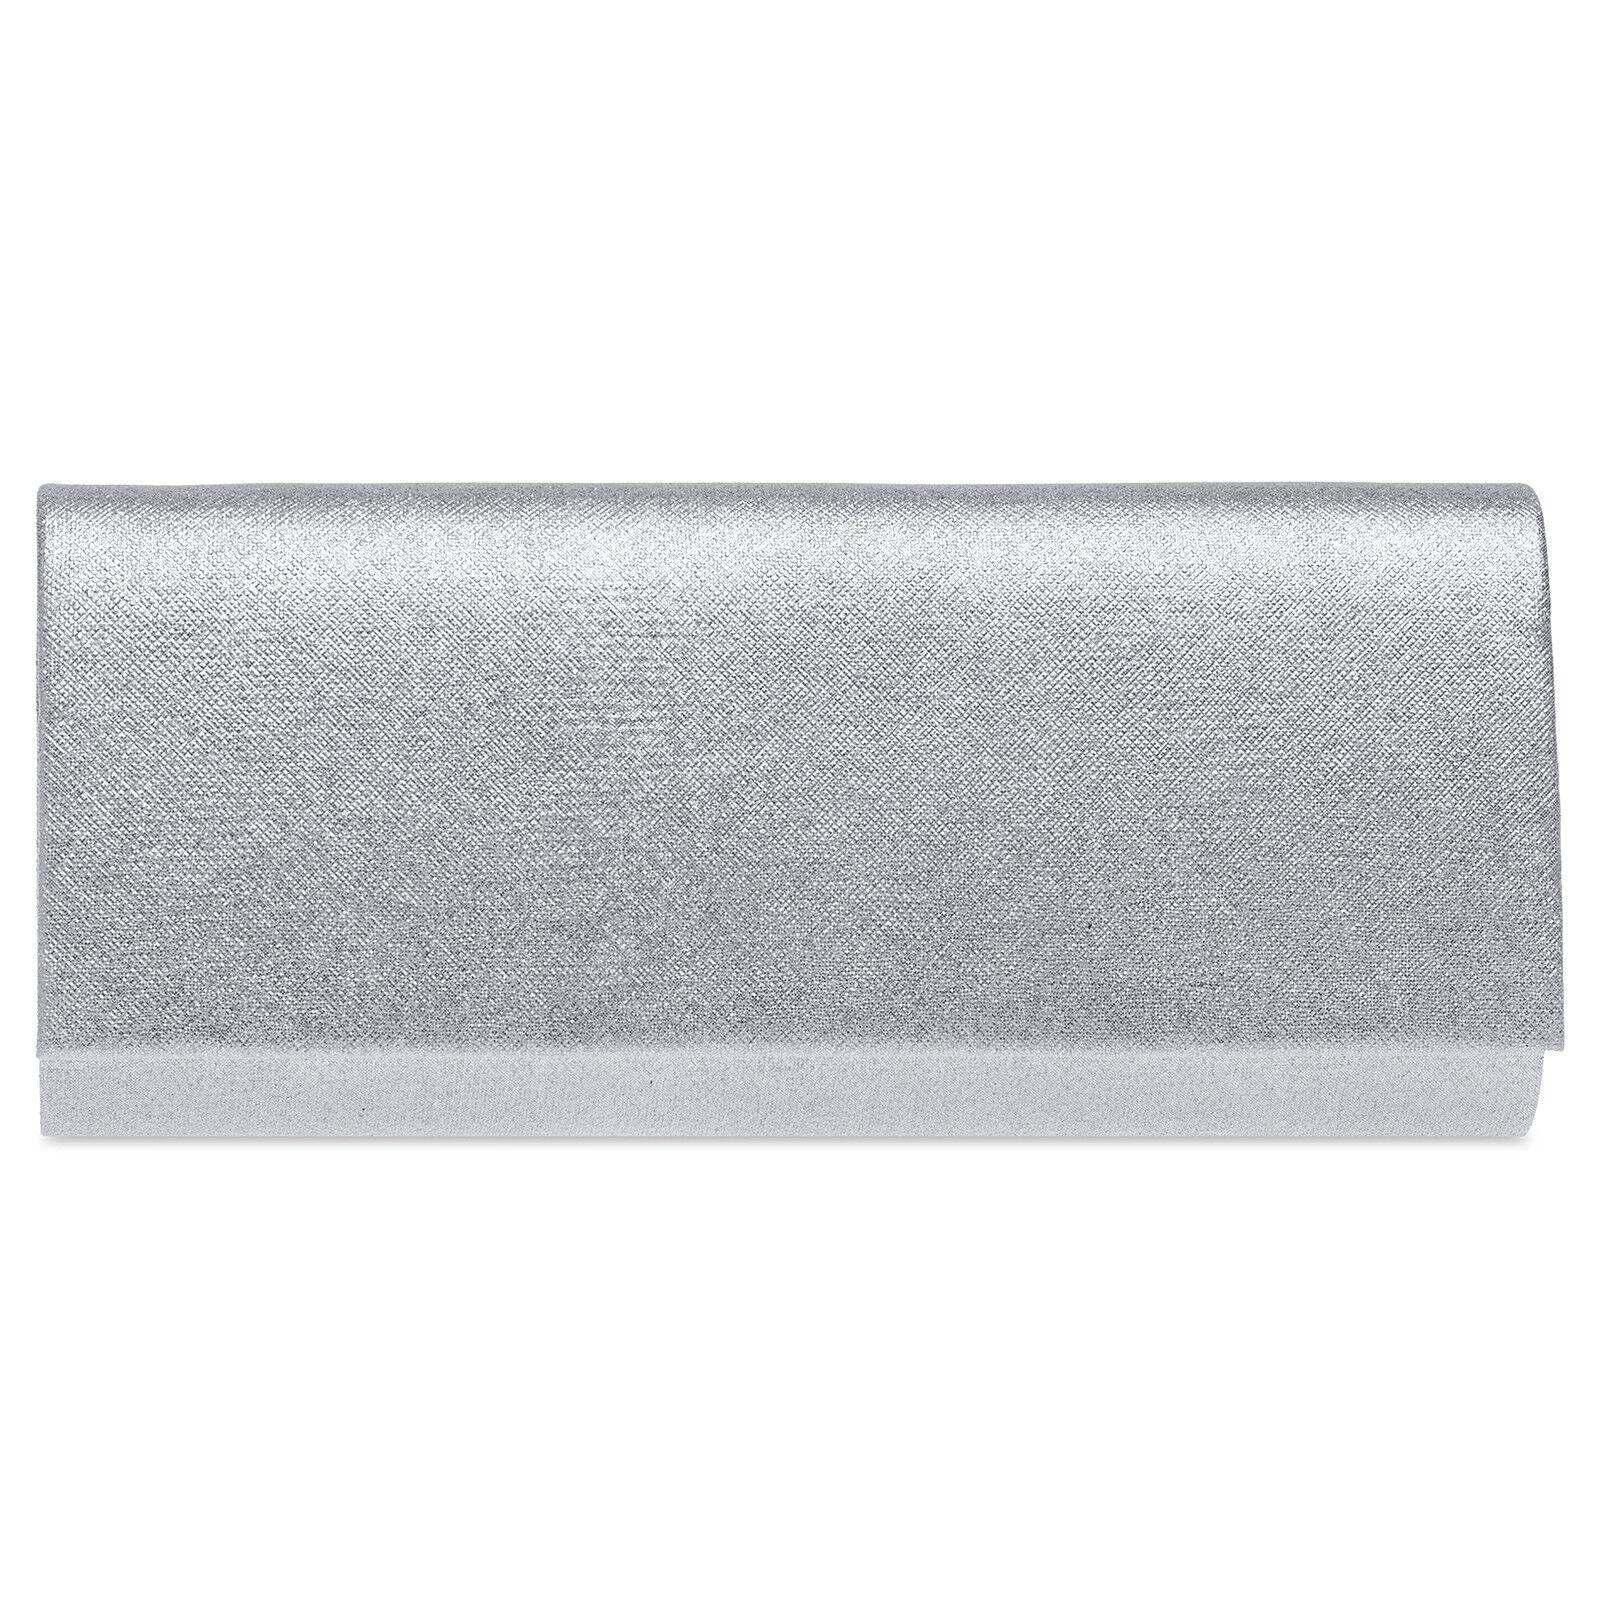 Caspar TA508 Damen Baguette Clutch Tasche Abendtasche elegant Metallic Glanz